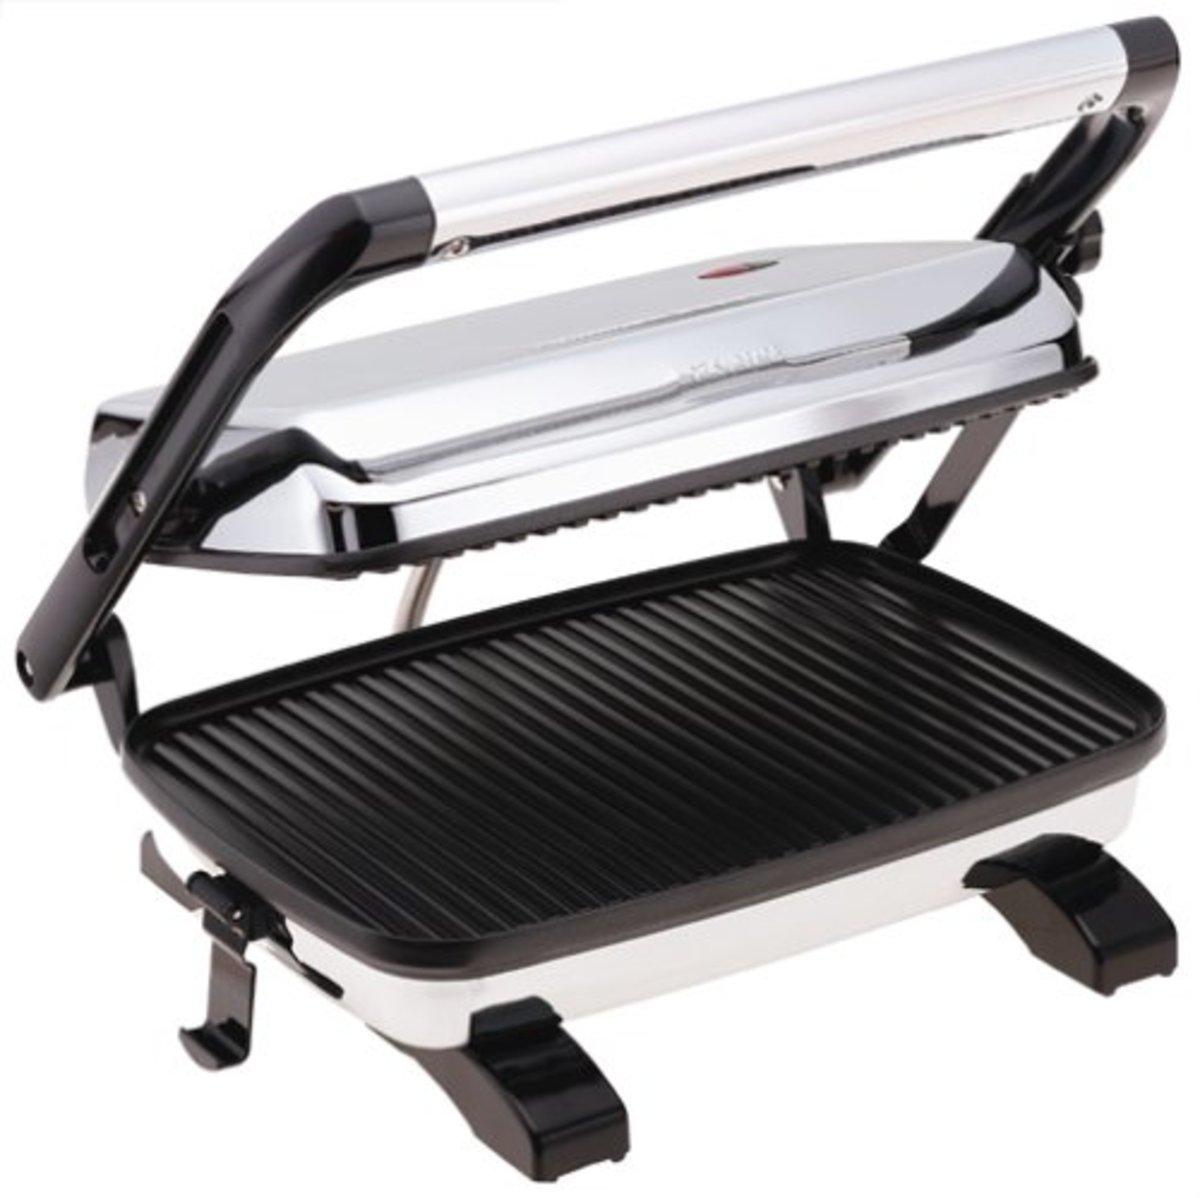 panini press